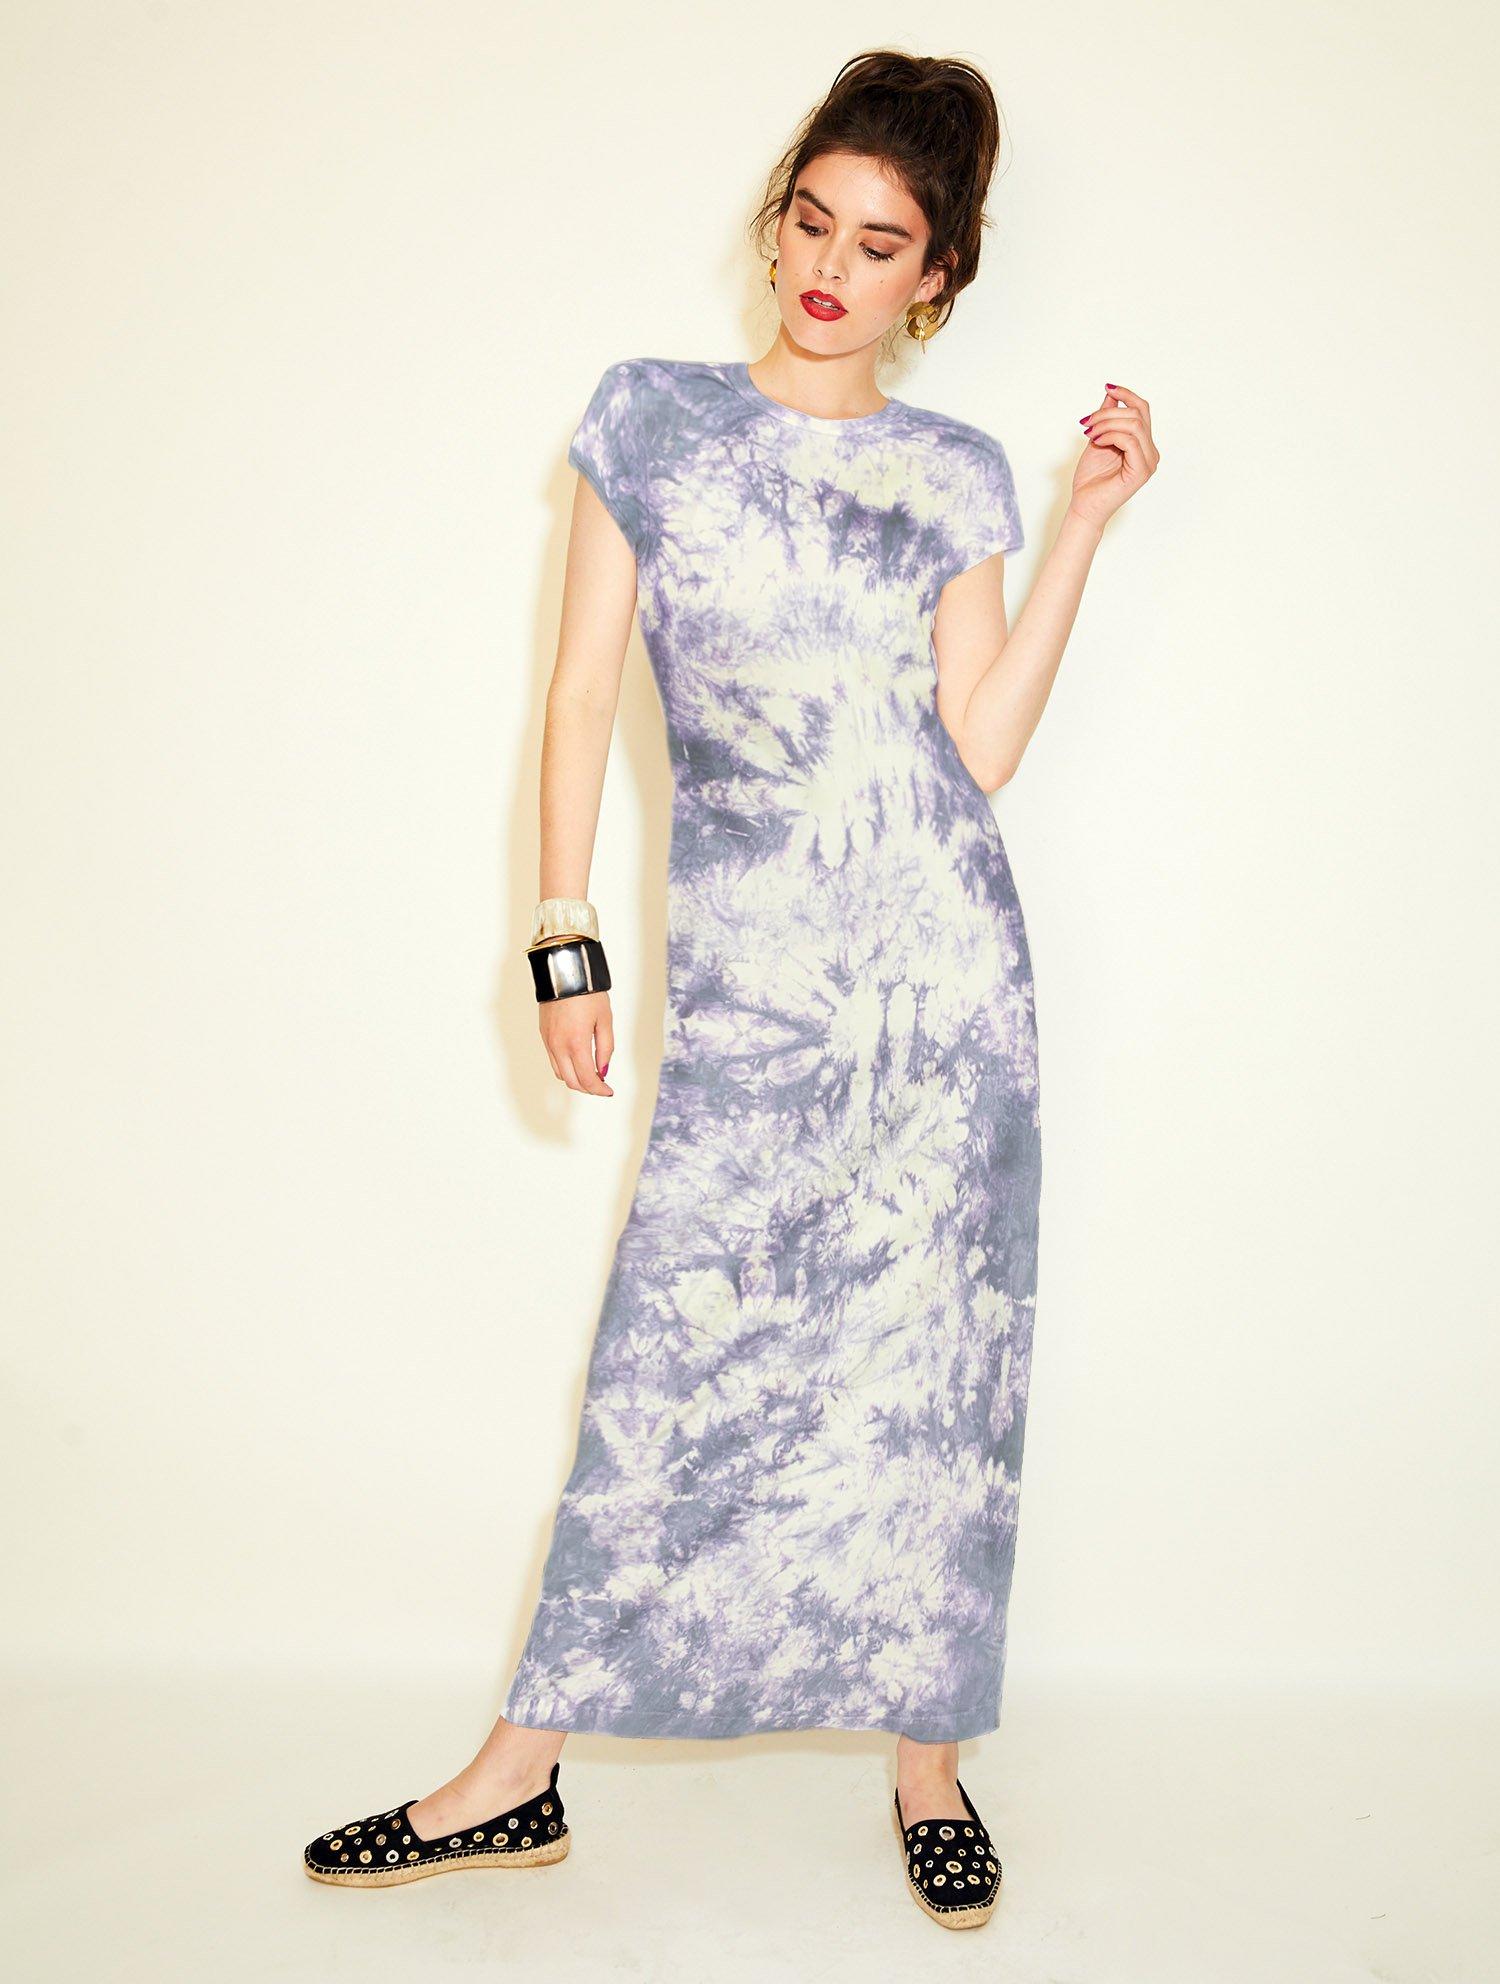 Monogram Studio 'Cloud Tie Dye' cap sleeve dress,  $98